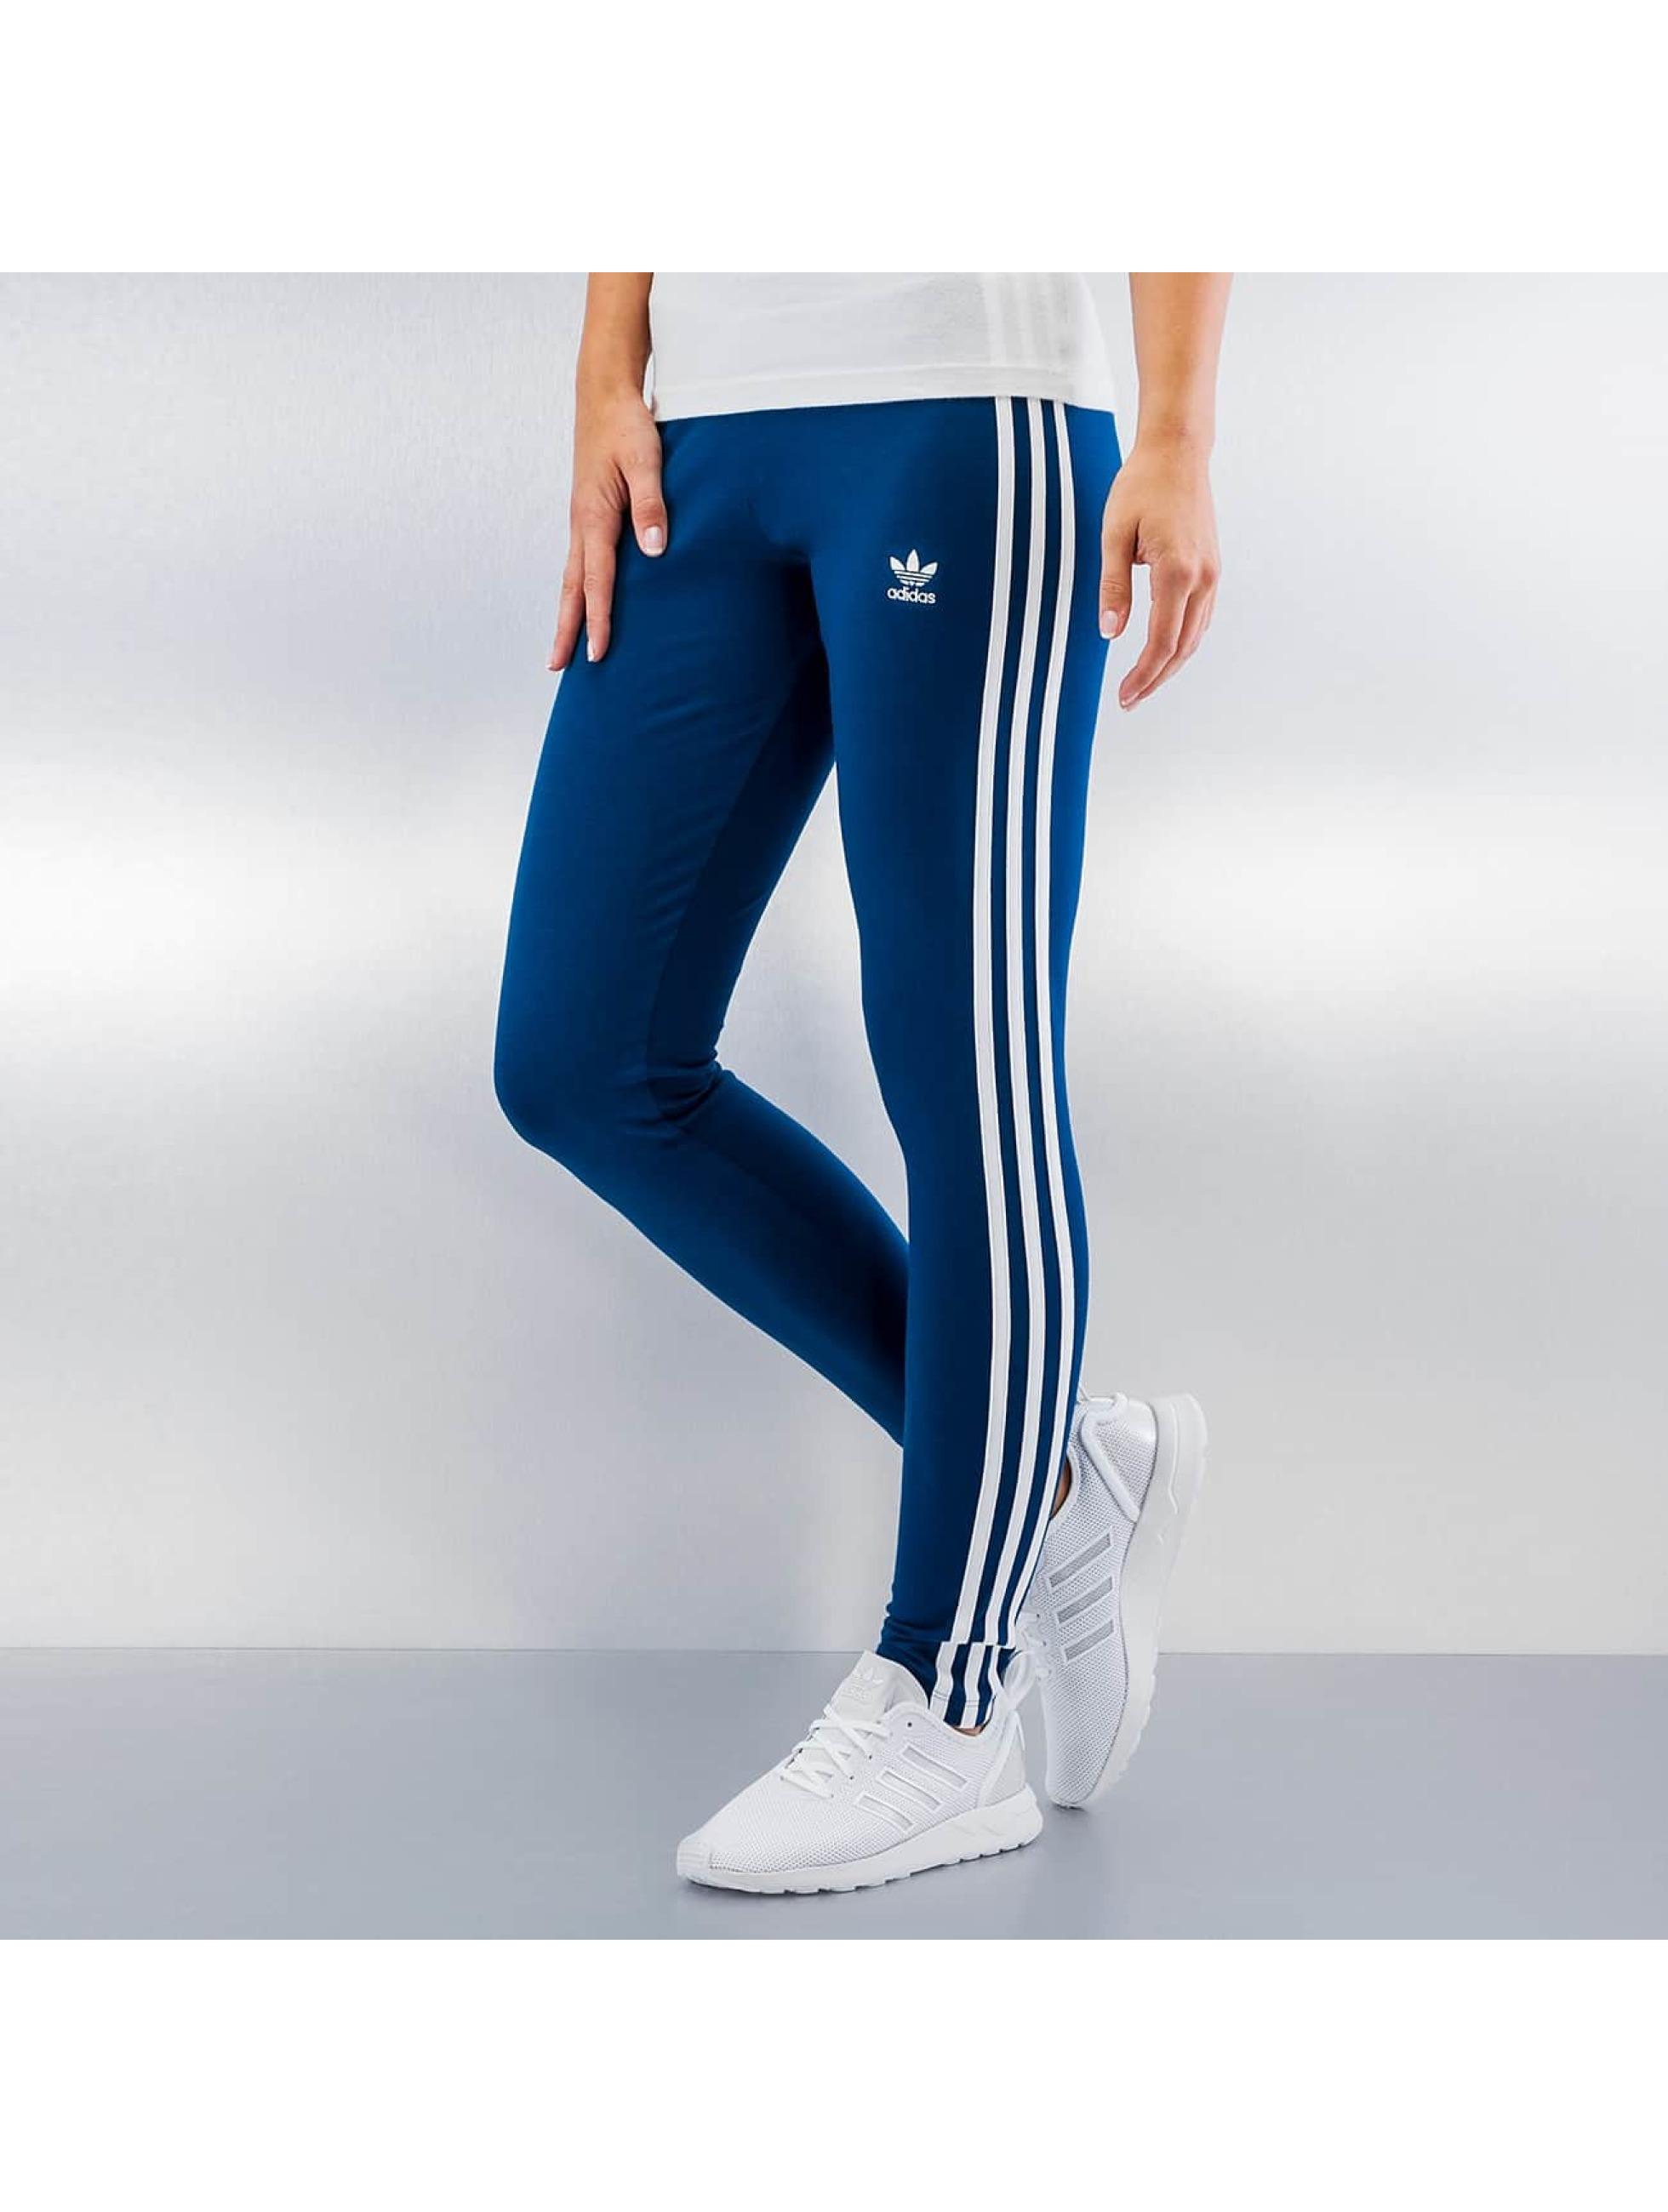 Adidas Pantalon / Leggings 3STR en bleu 285494